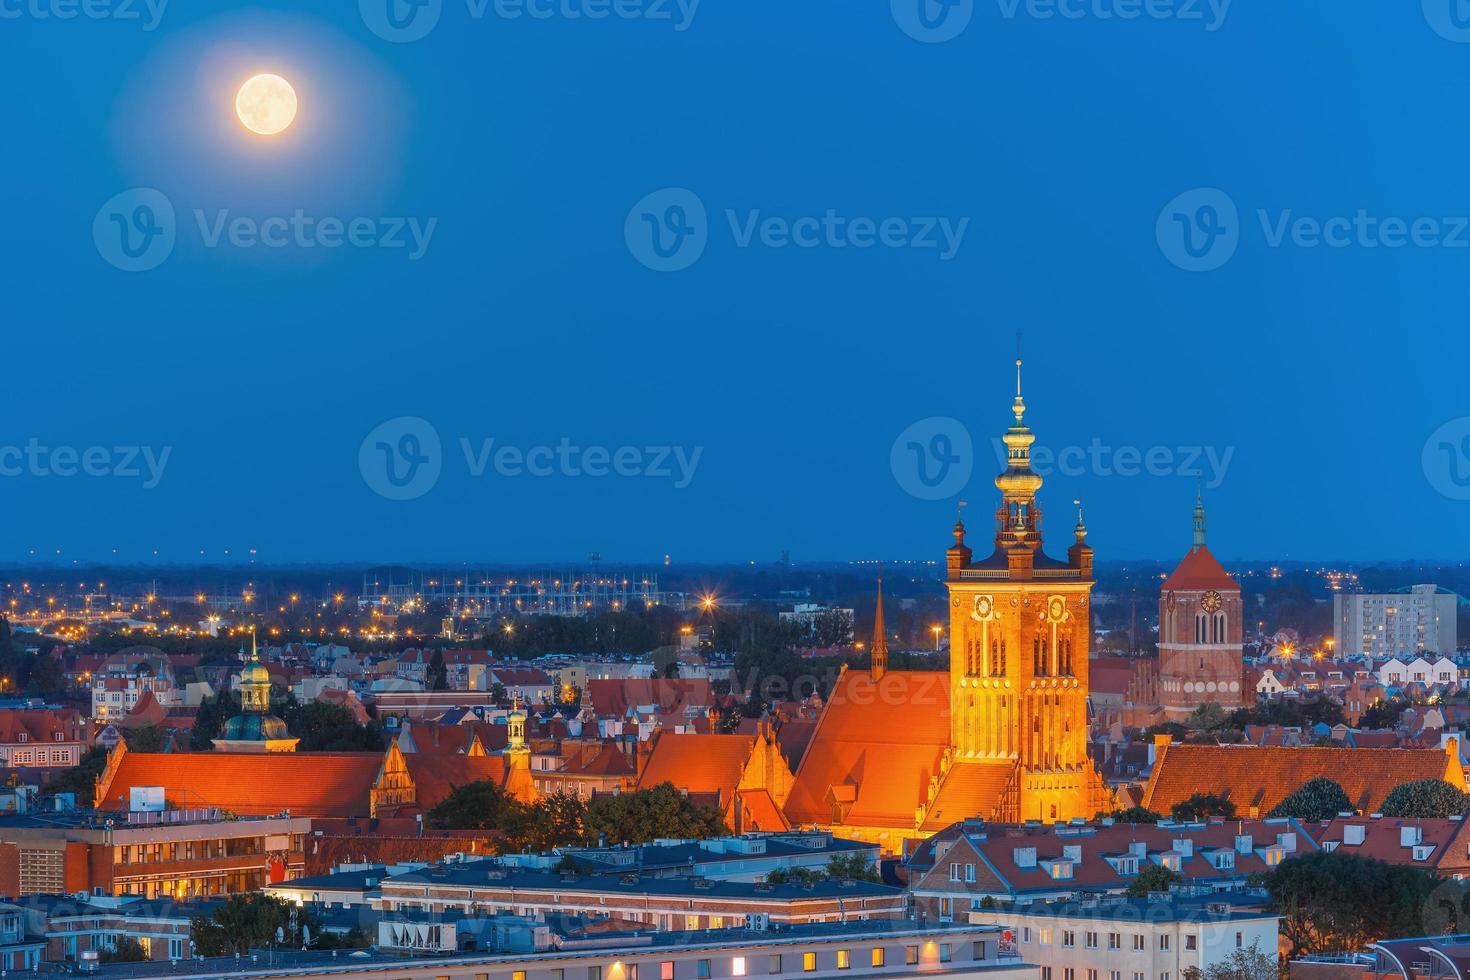 Church of Saint Catherine at night, Gdansk, Poland photo